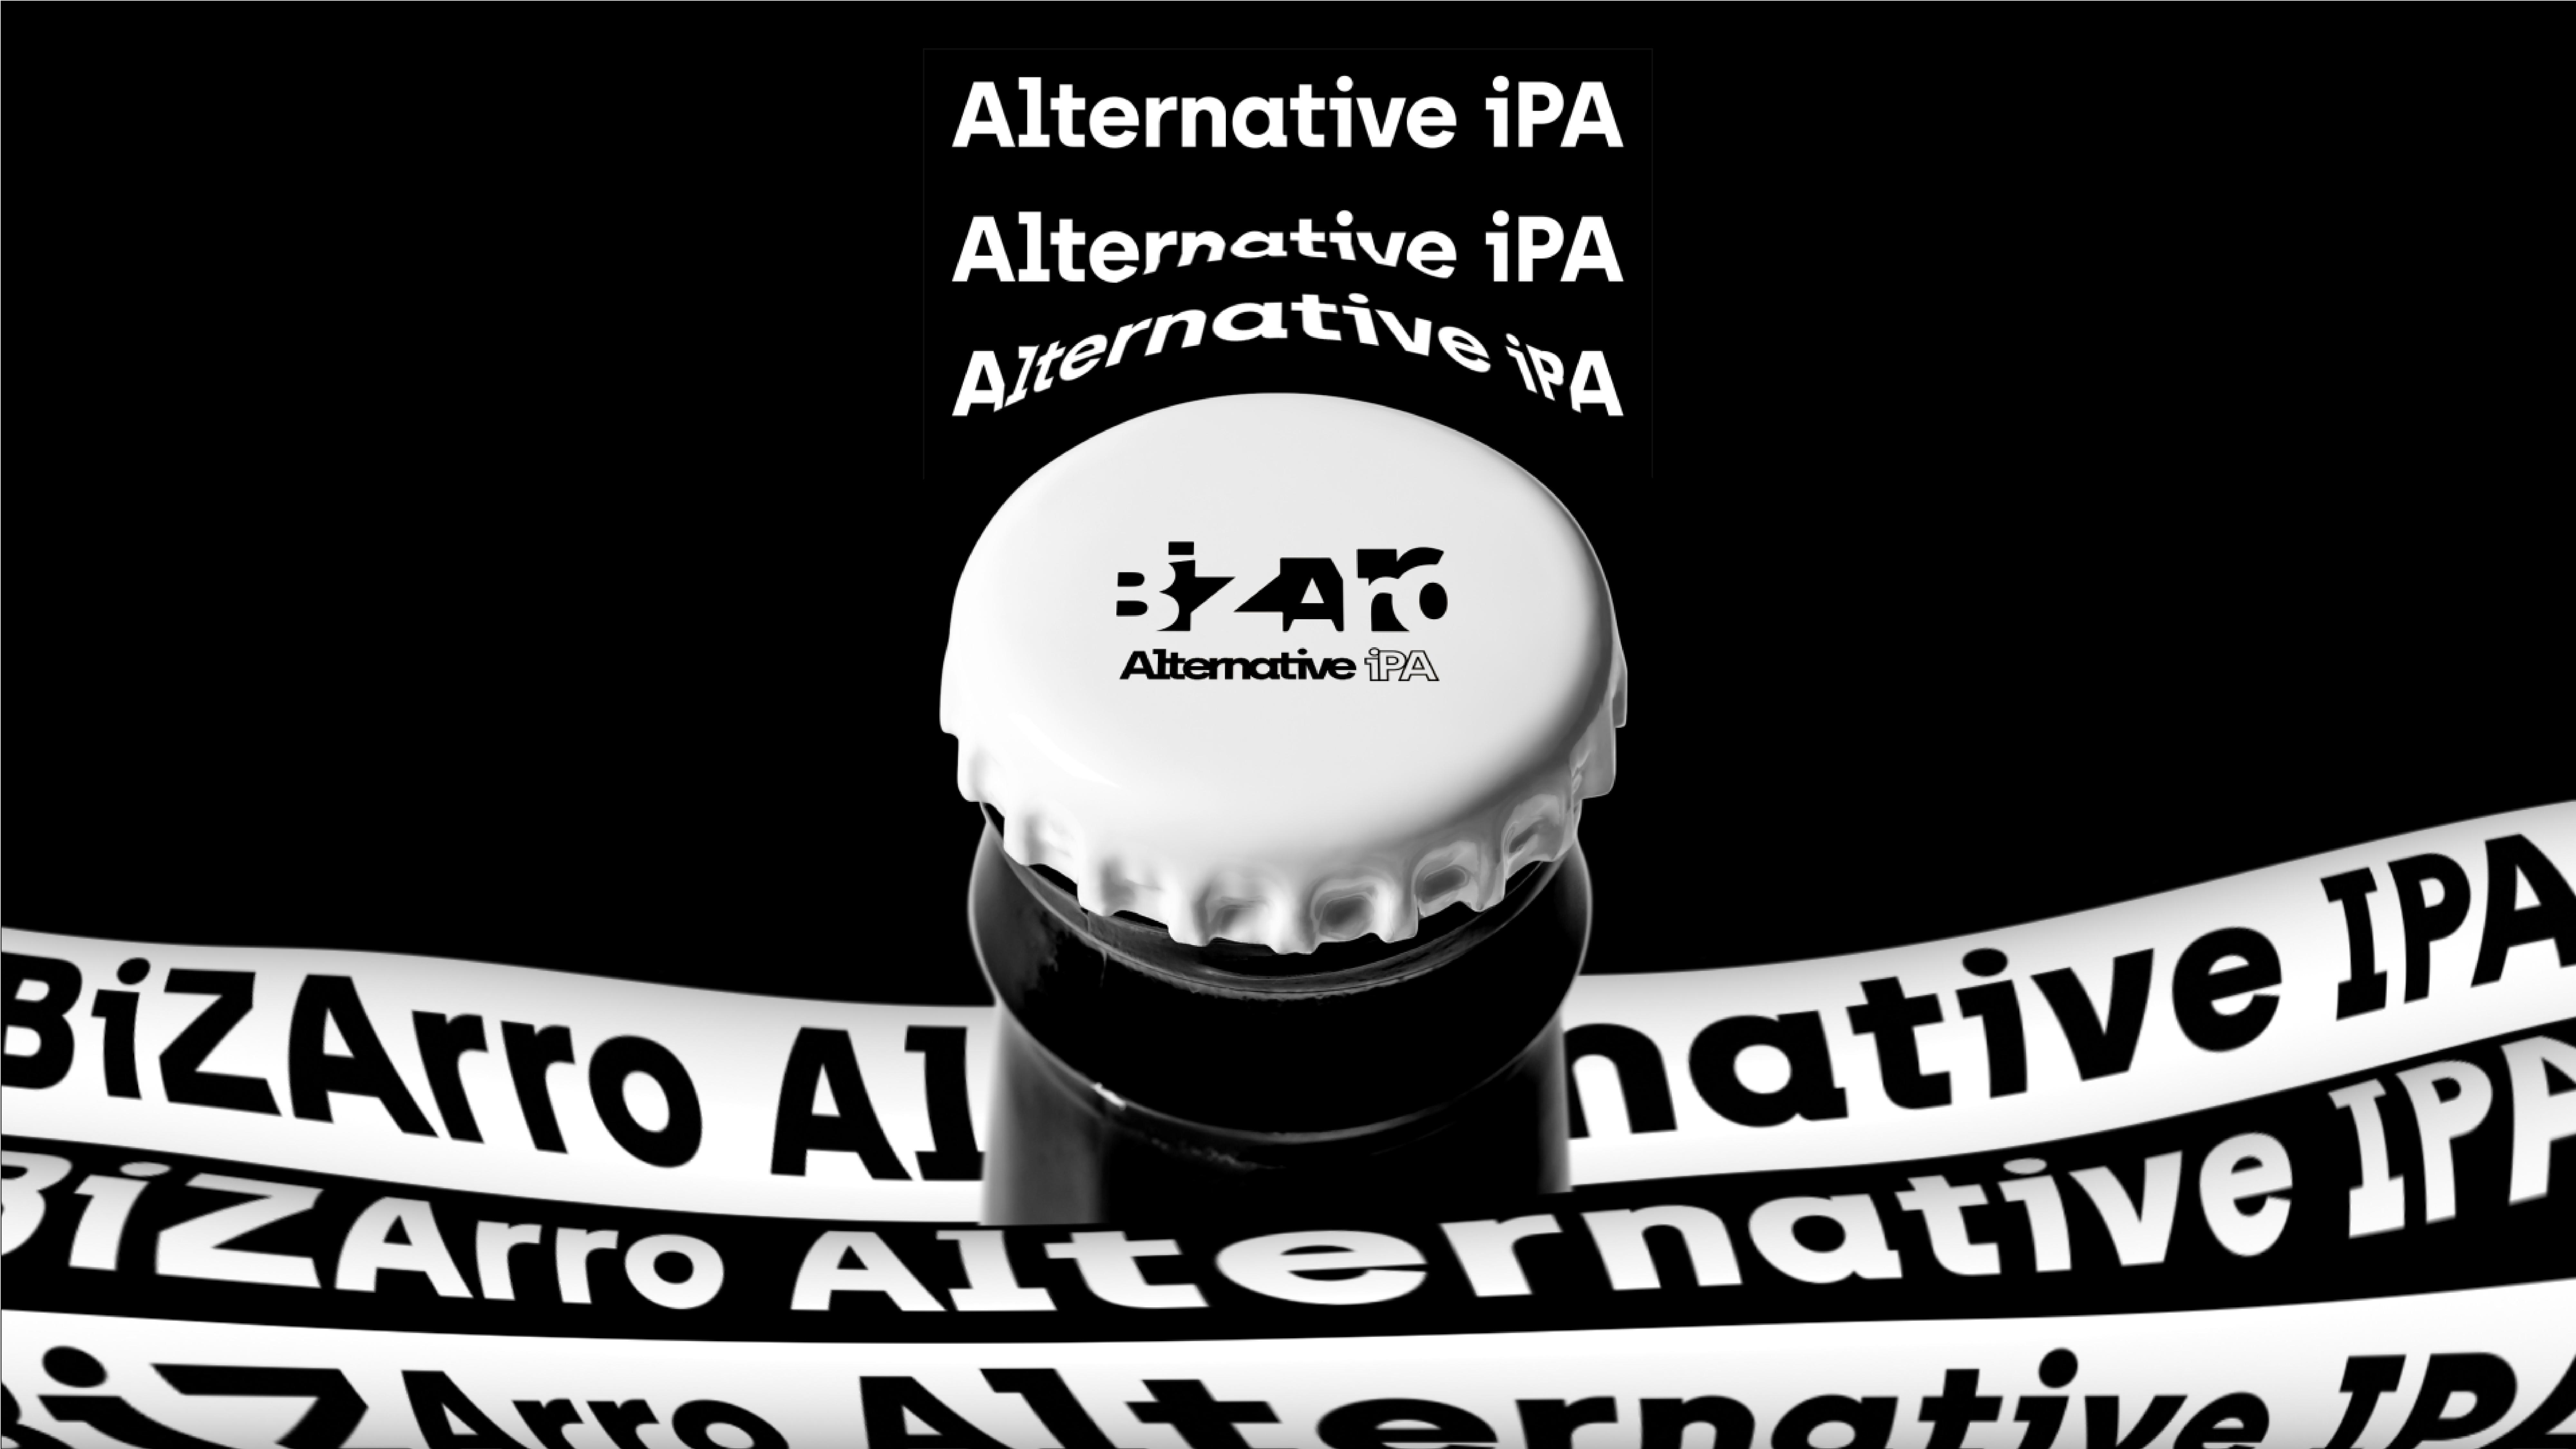 BIZARRO Alternative IPA by Marco Arroyo-Vázquez - Creative Work - $i